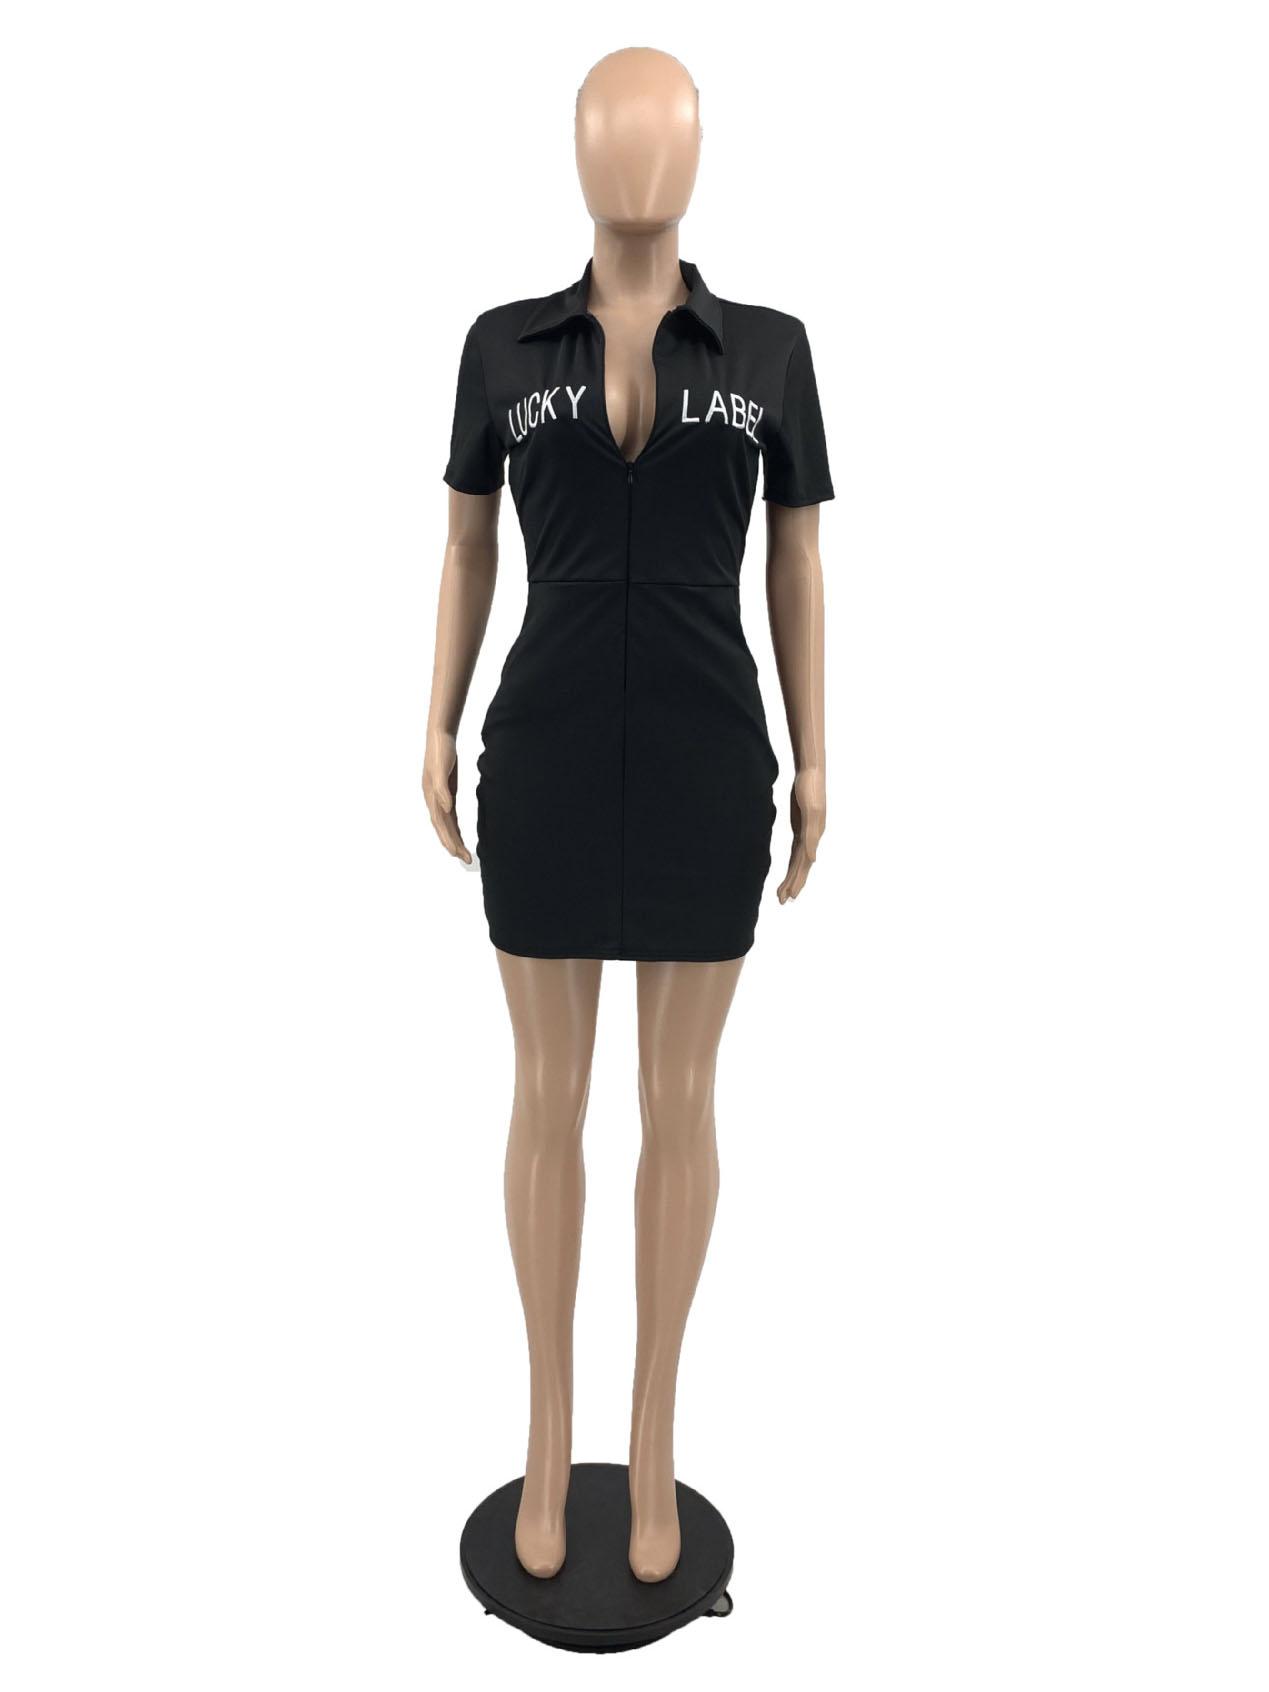 Leisure Letter Zipper Up Short Sleeve Pocket Dress